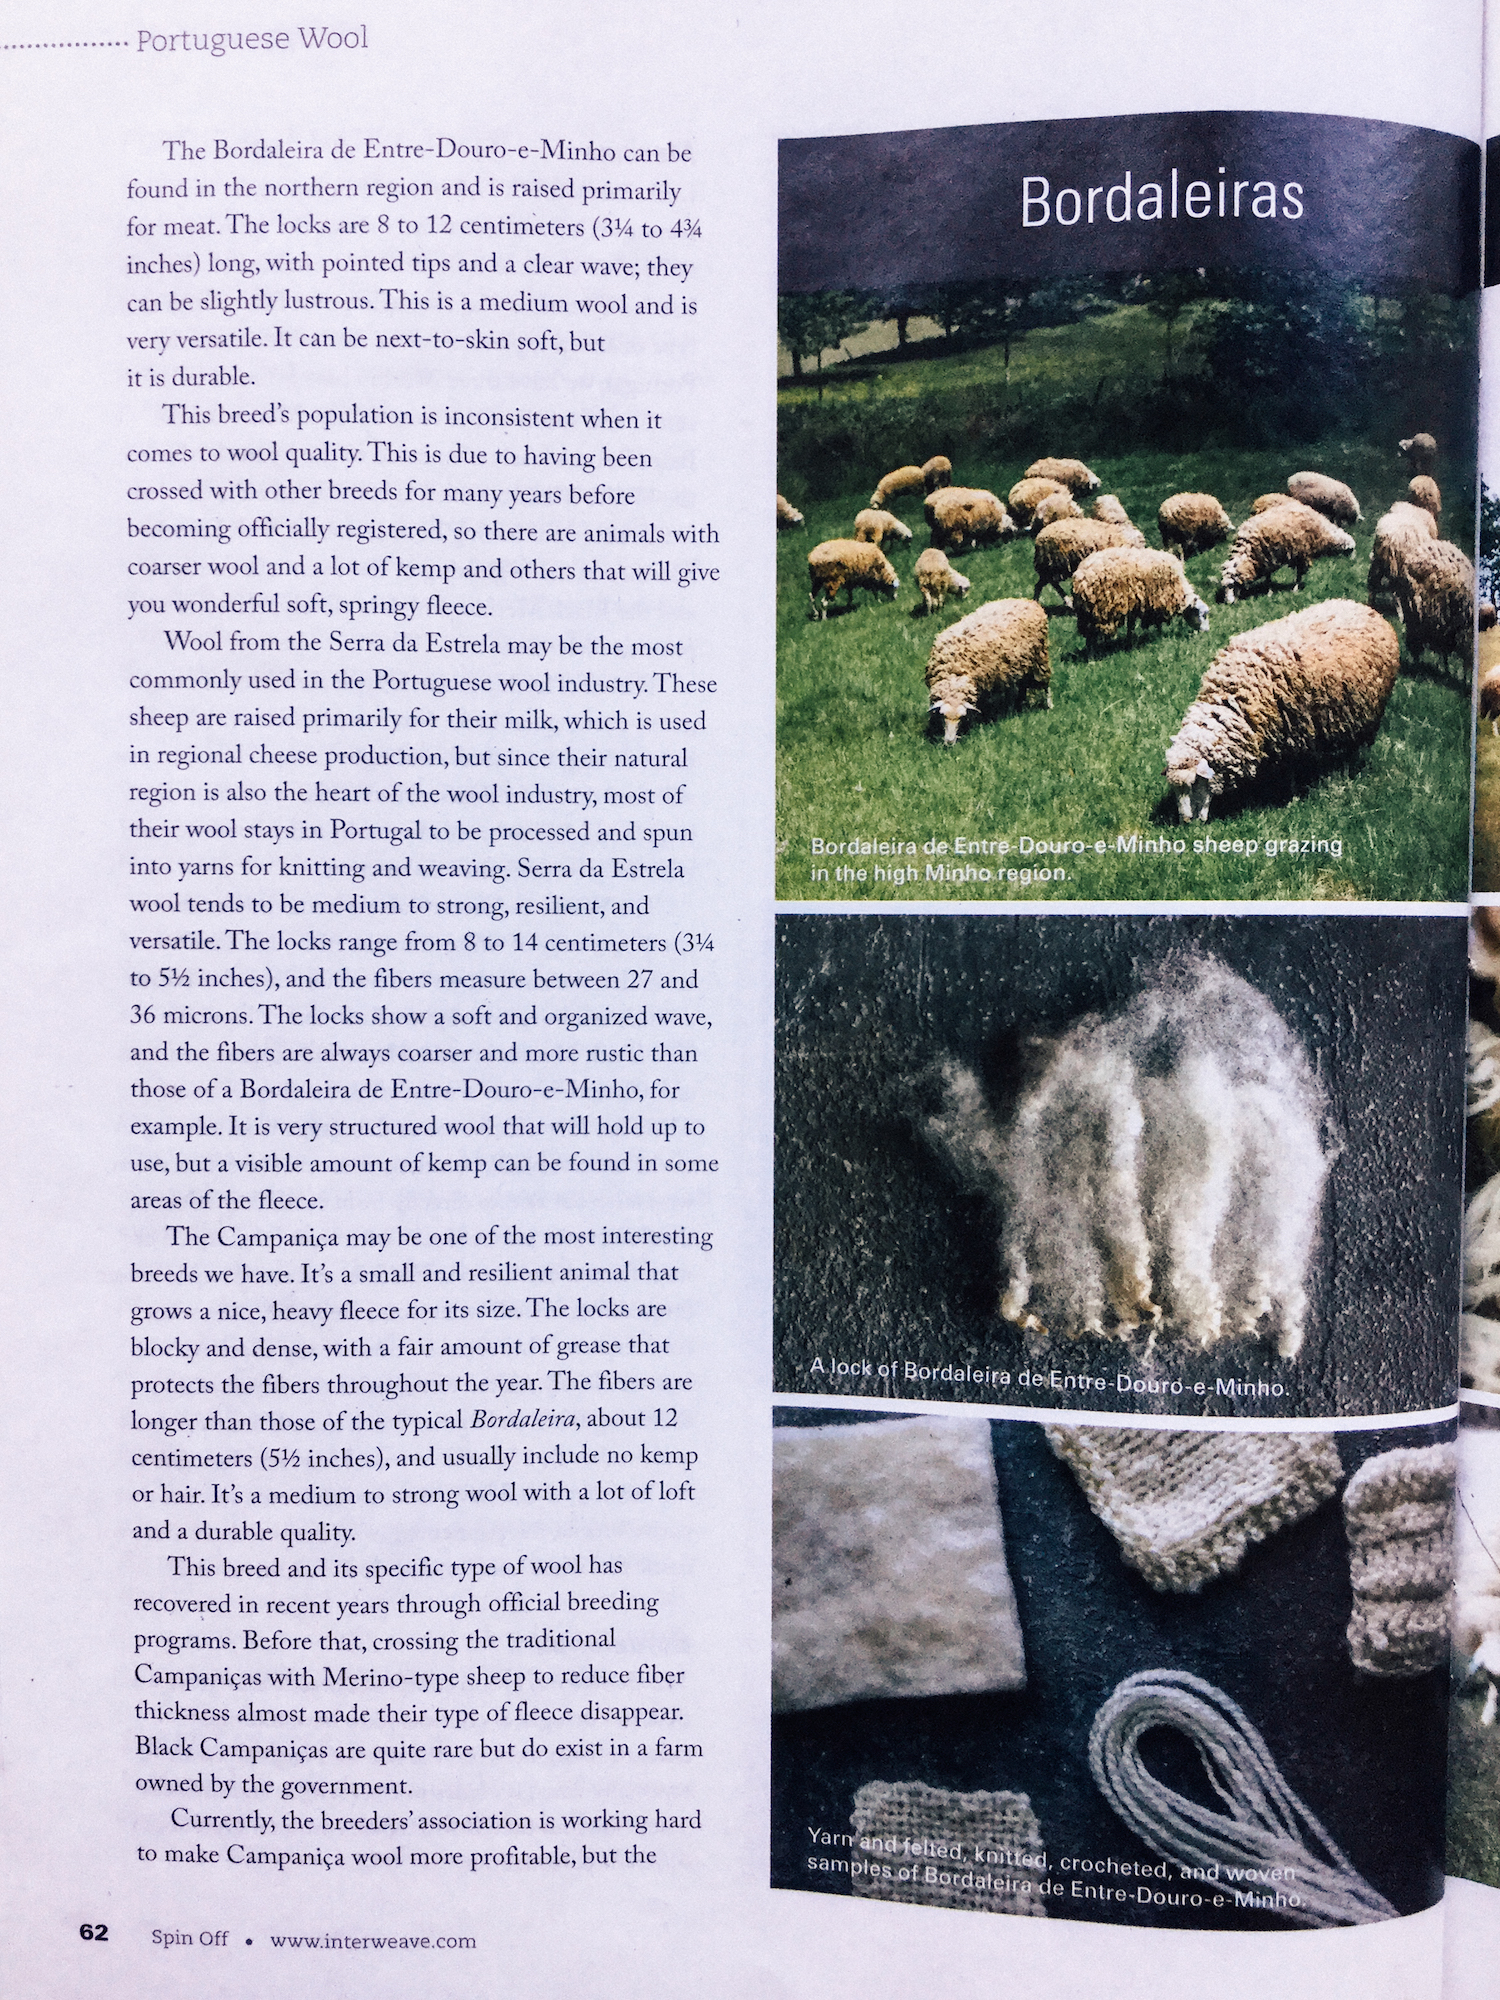 portuguese-wool-7.jpg